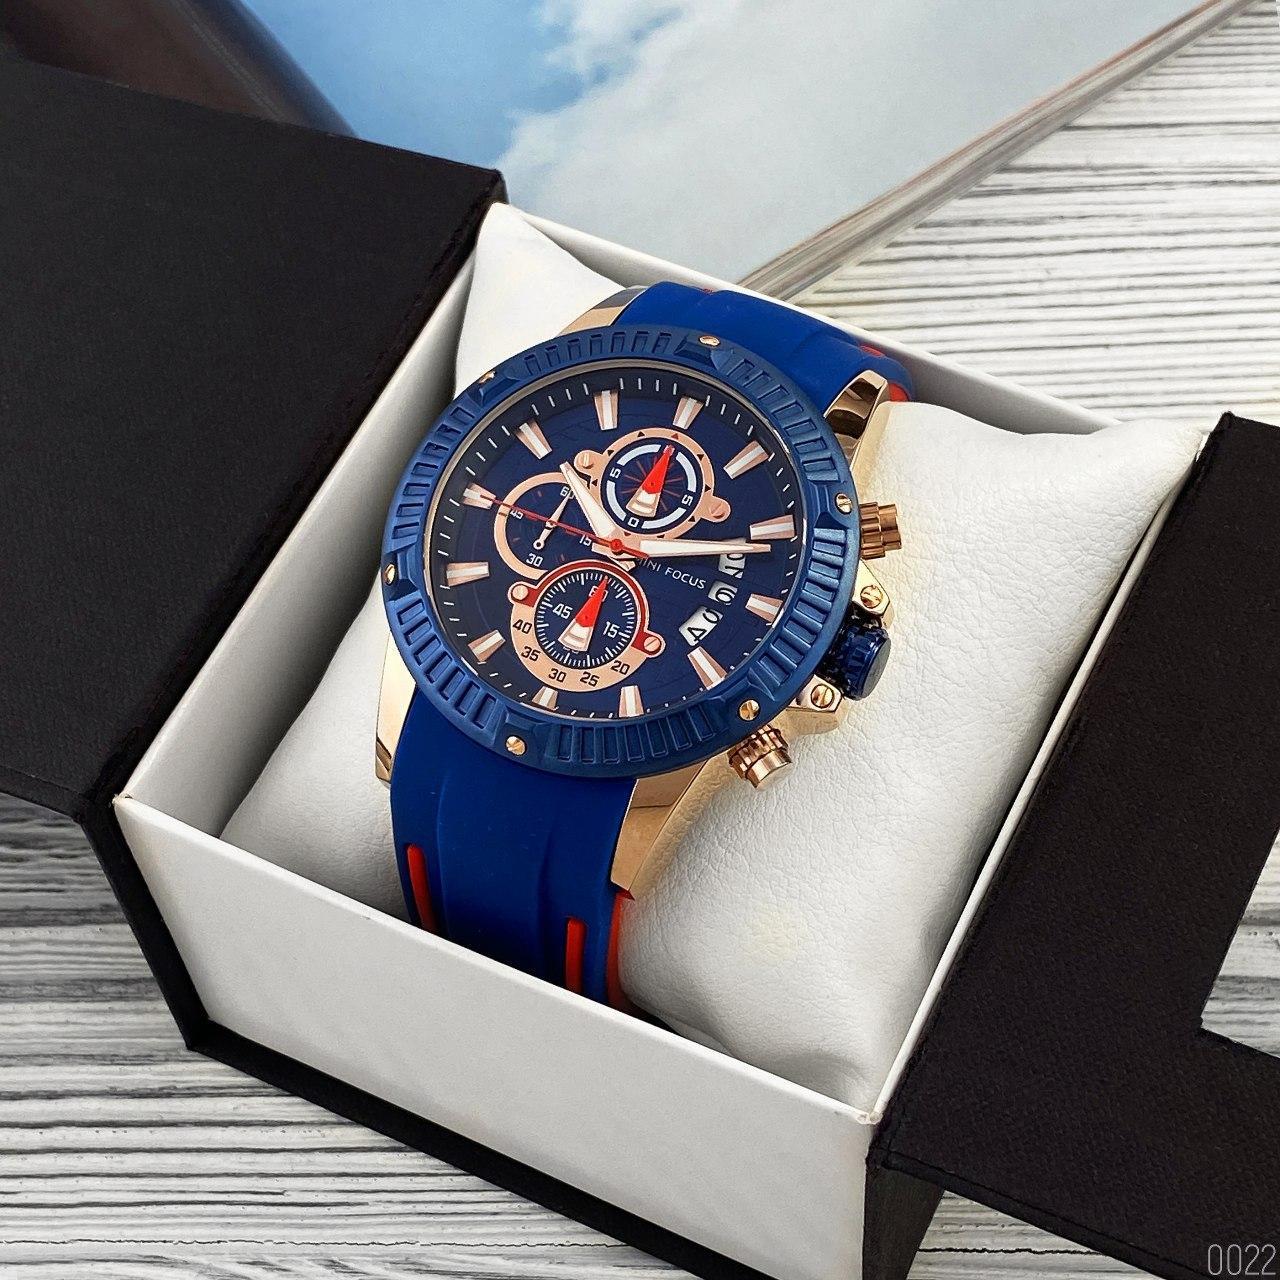 Часы мужские кварцевые Mini Focus MF0244G.01 Blue-Cuprum-Red AB-1095-0022